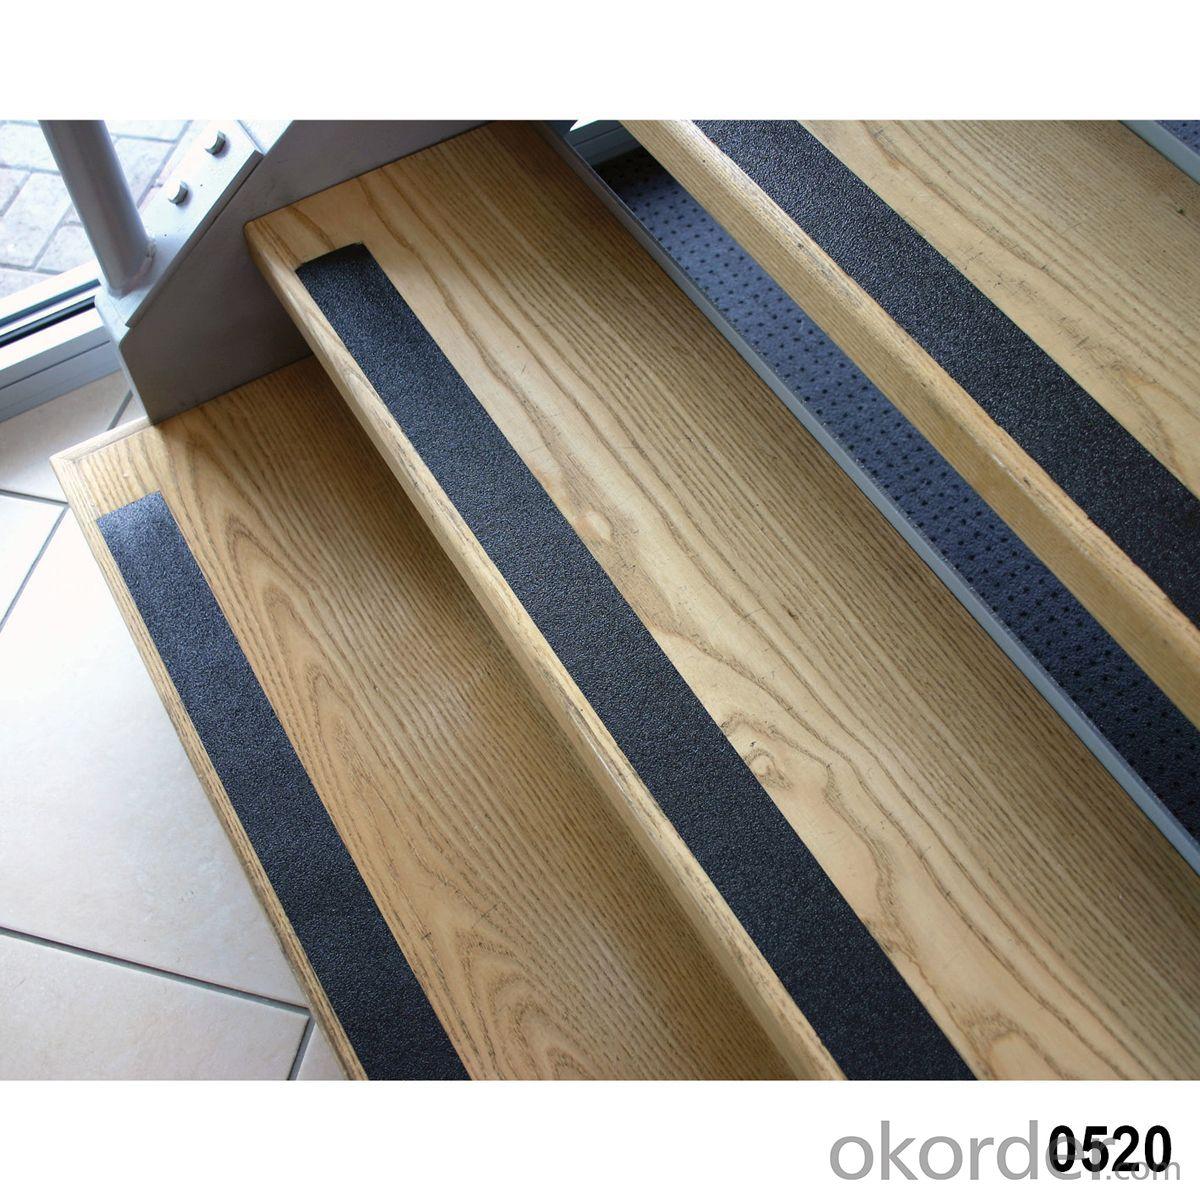 Anti-Slip Floor Tape Black Color High Quality